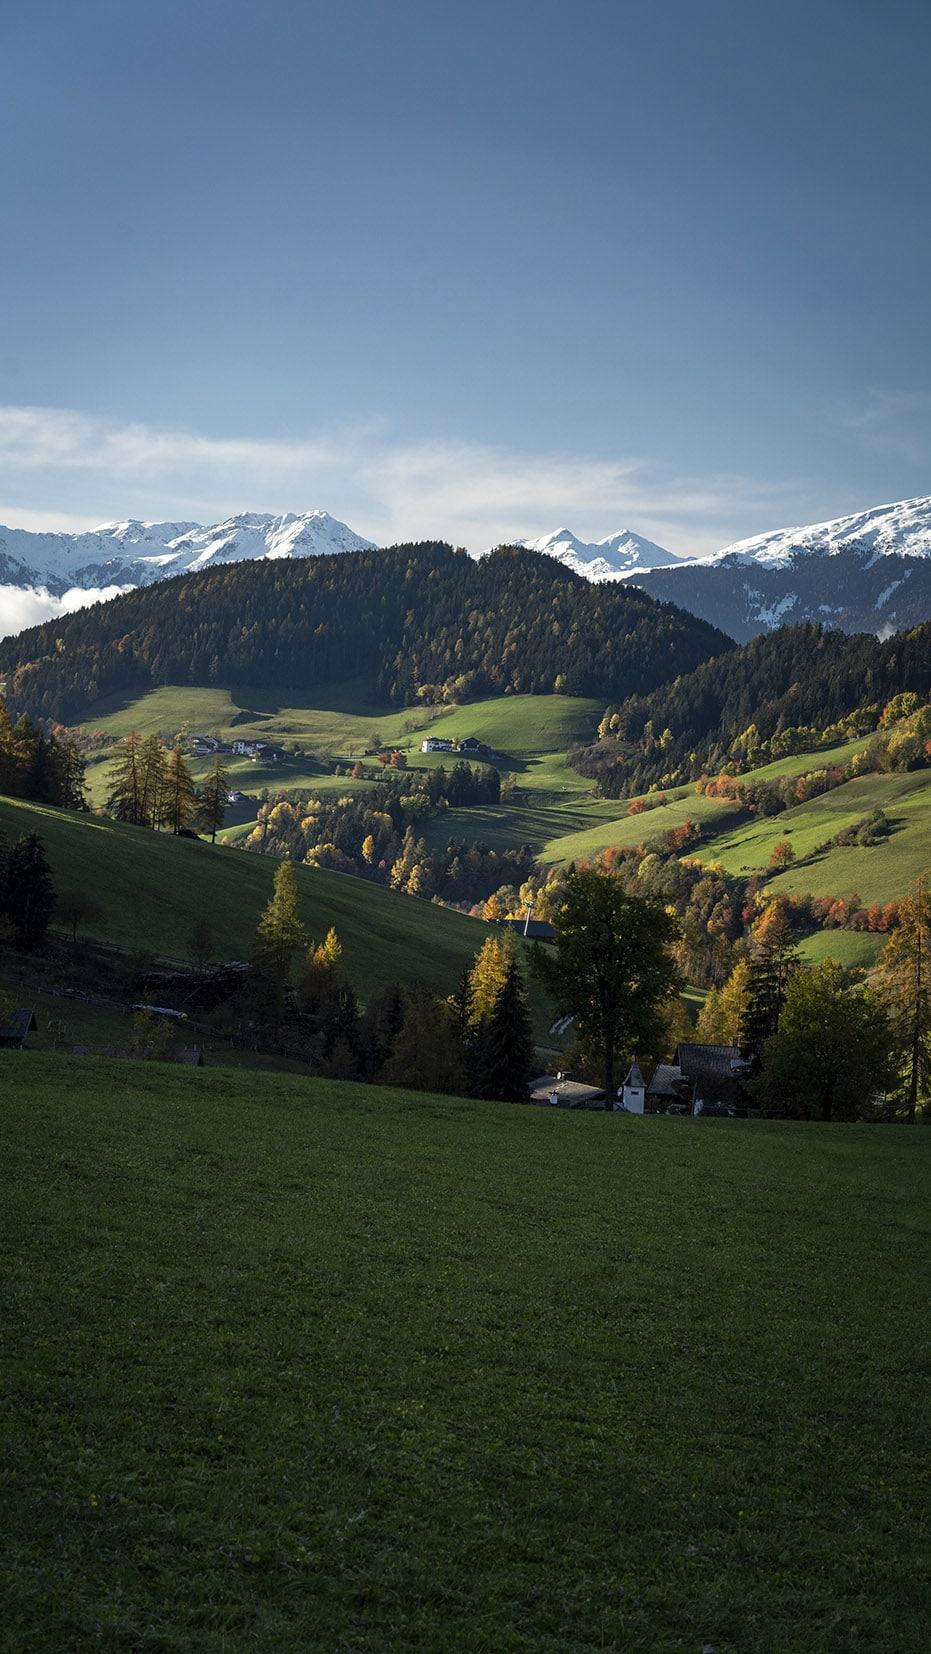 Collines Dolomites sapins automne montagnes